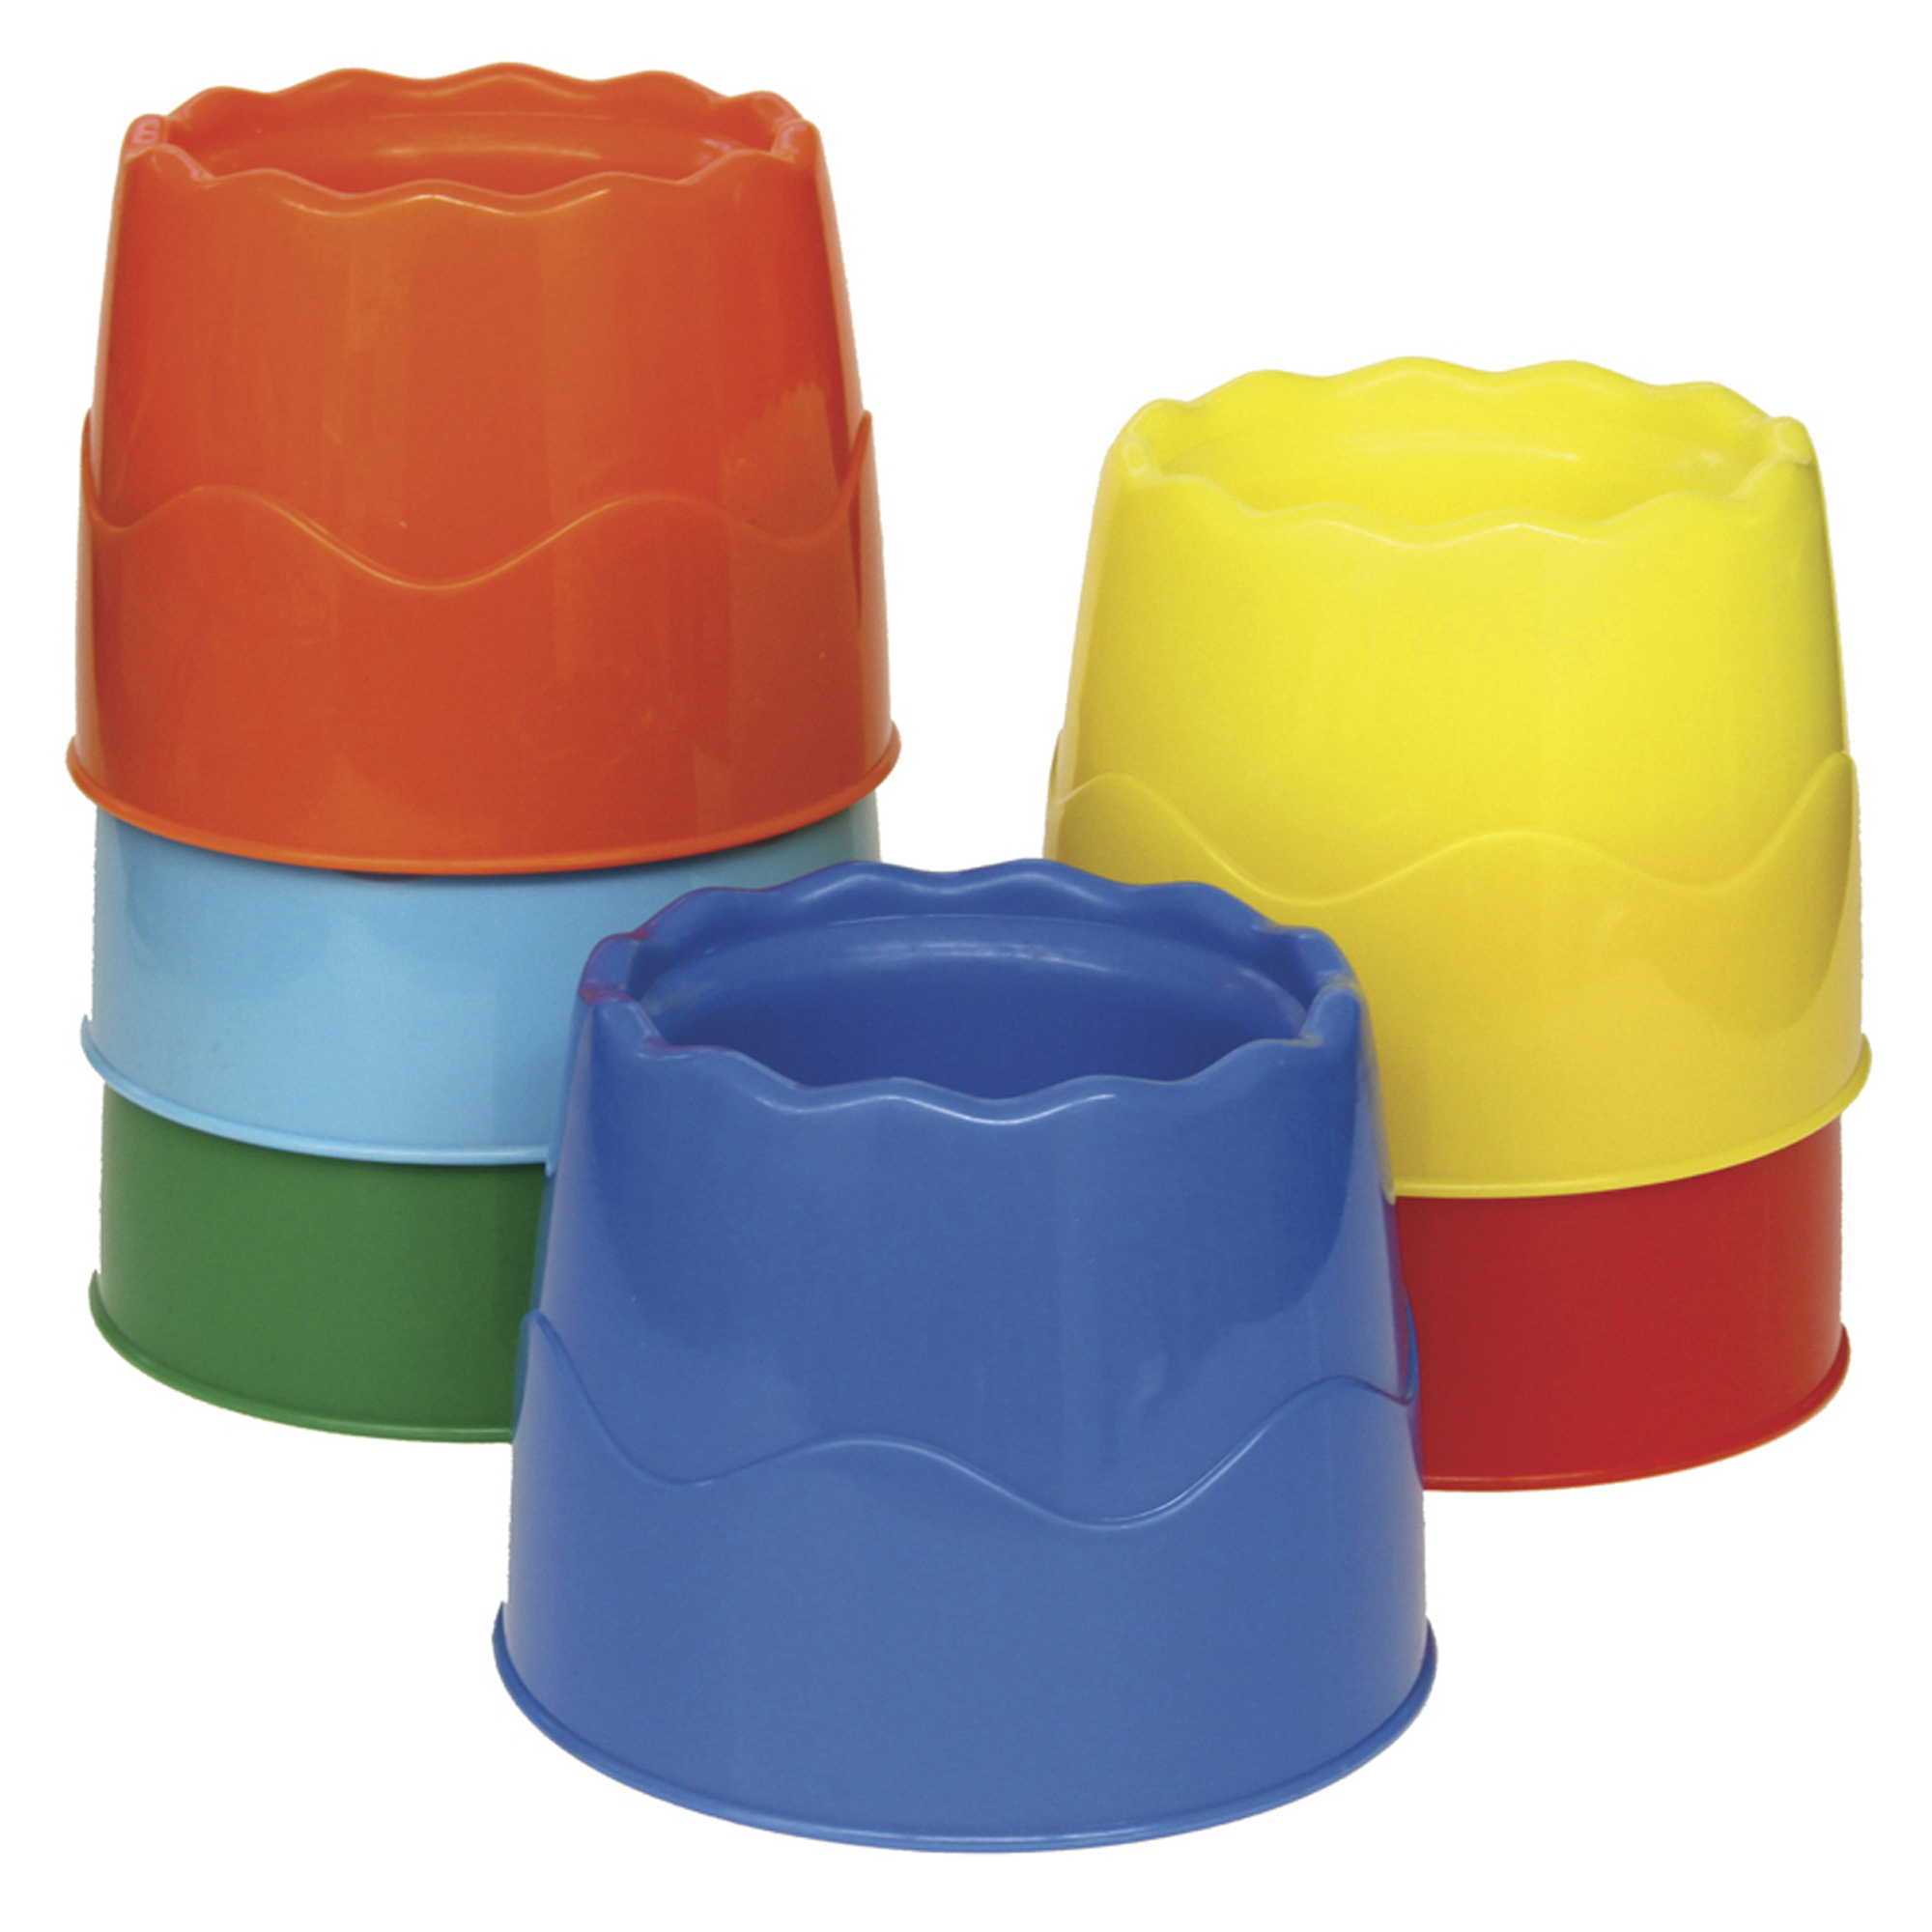 "Creativity Street® Stable Water Pots, Assorted Colors, 4.5"" Diameter, 6 Per Pack, 2 Packs"